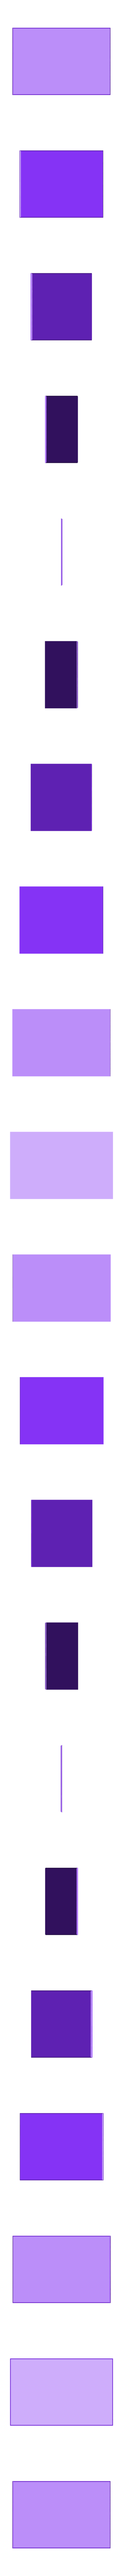 base_large.stl Download free STL file Saxon Burh Market • 3D printable object, Earsling